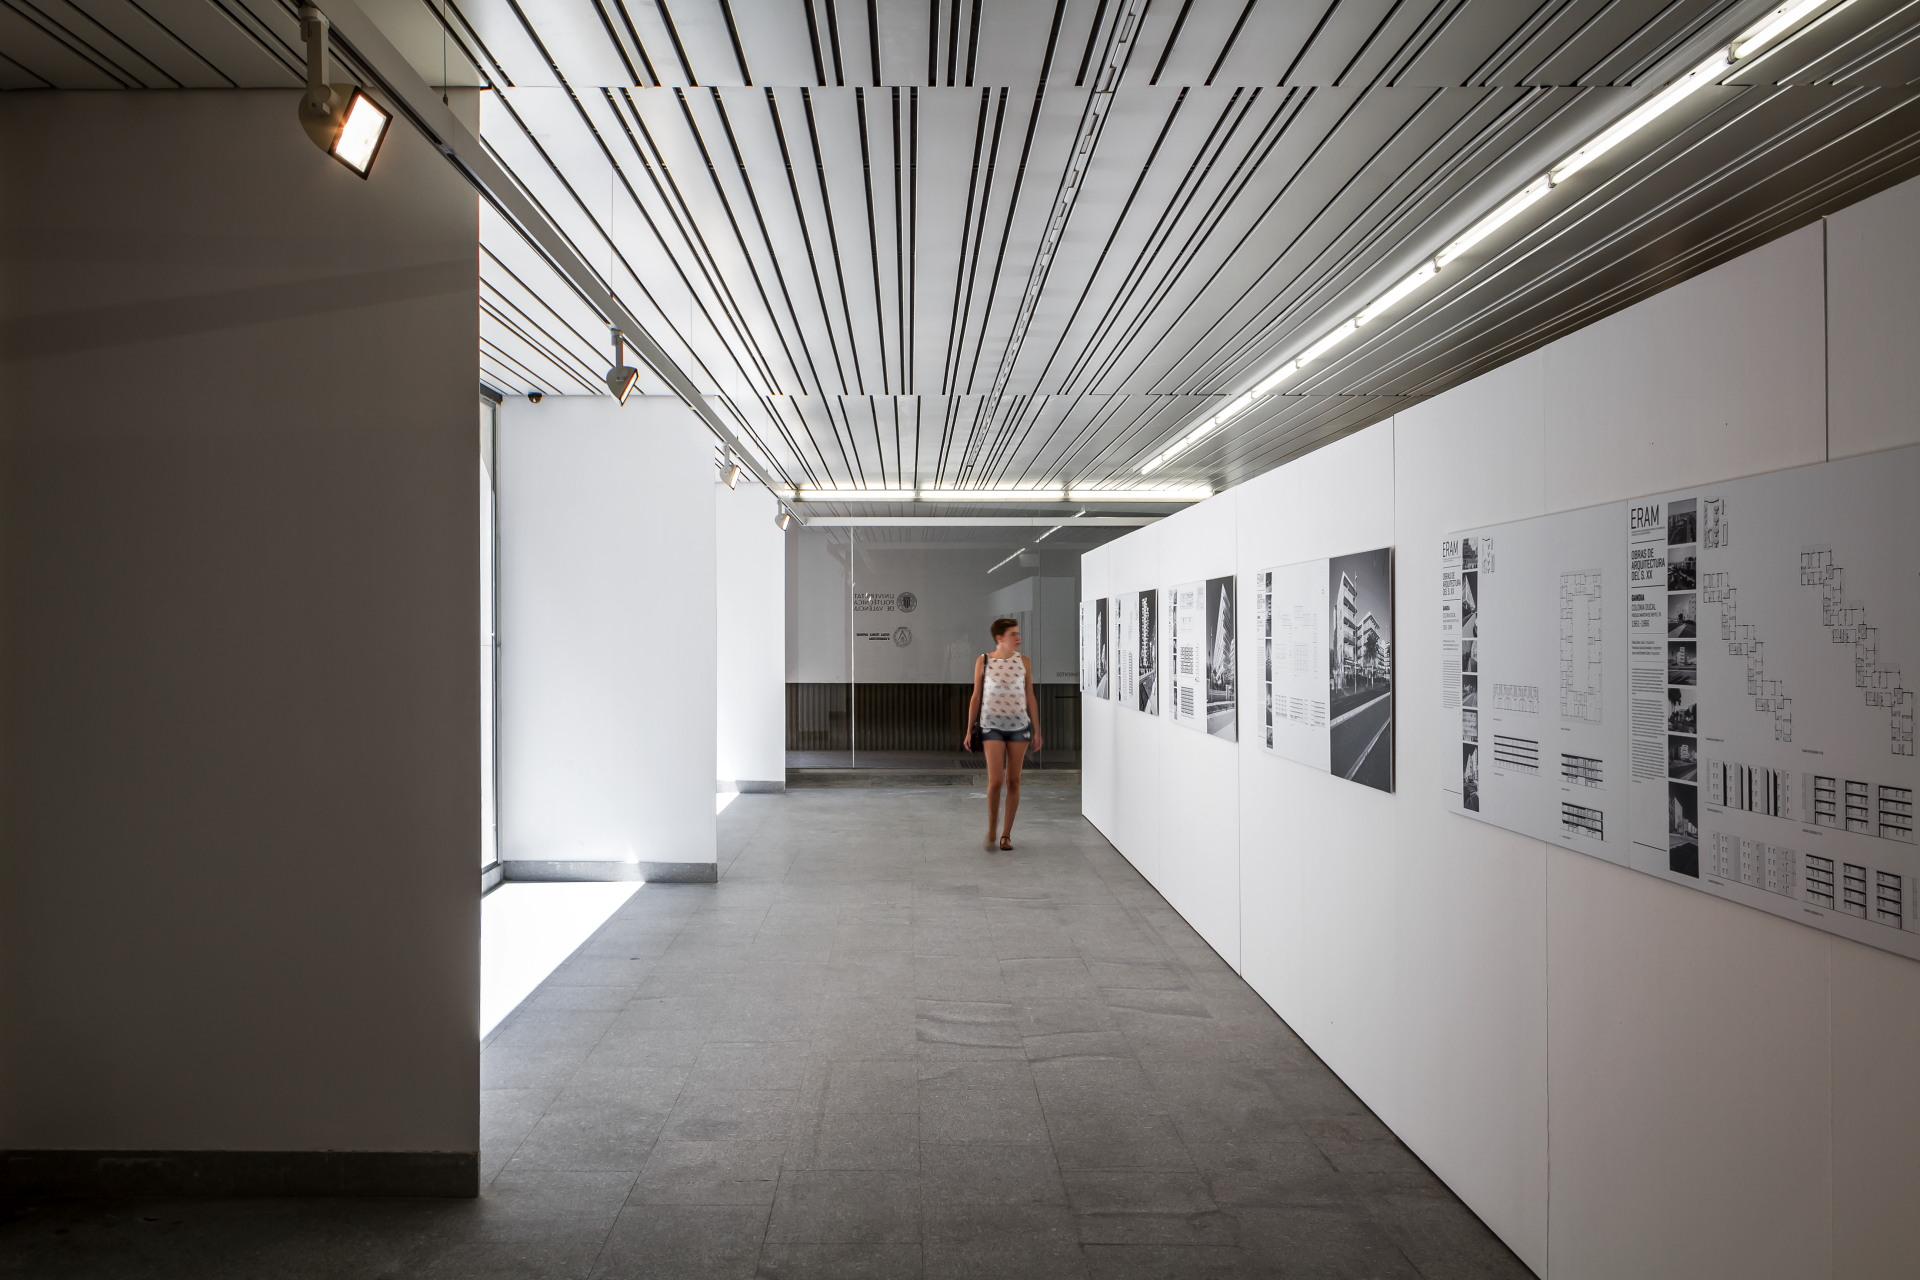 fotografia-arquitectura-valencia-german-cabo-upv-etsav-eram-exposicion (11)